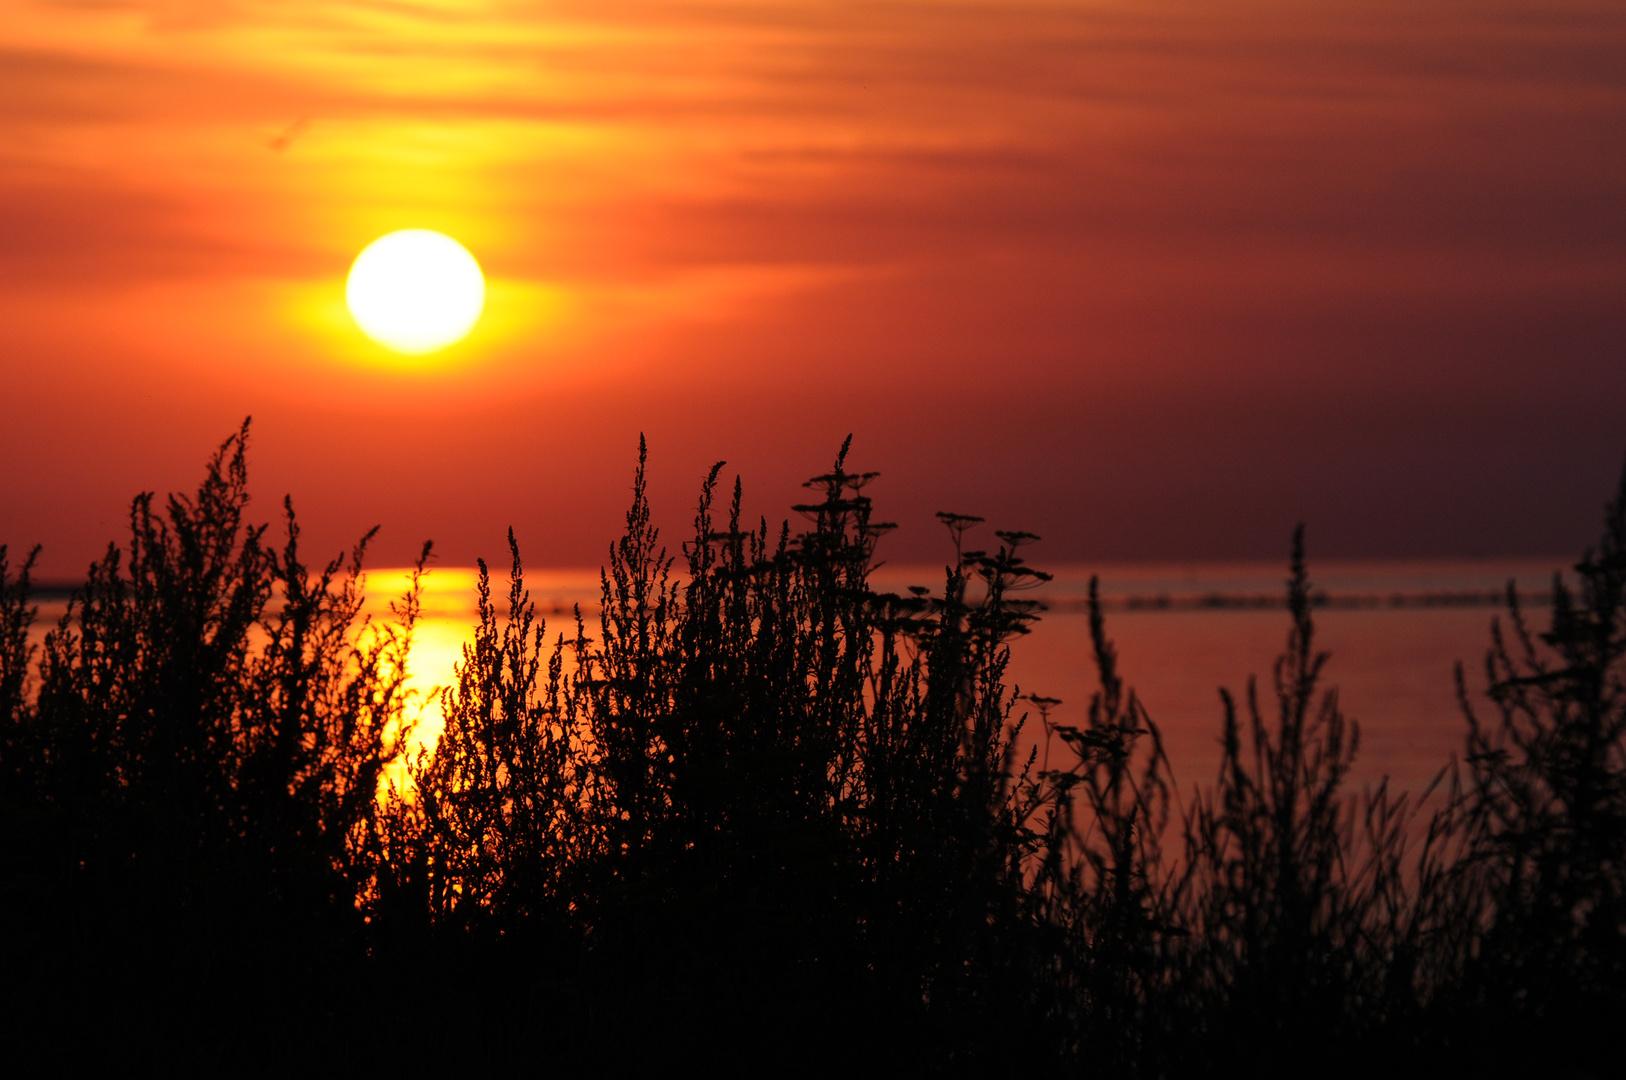 Sonne am Abend